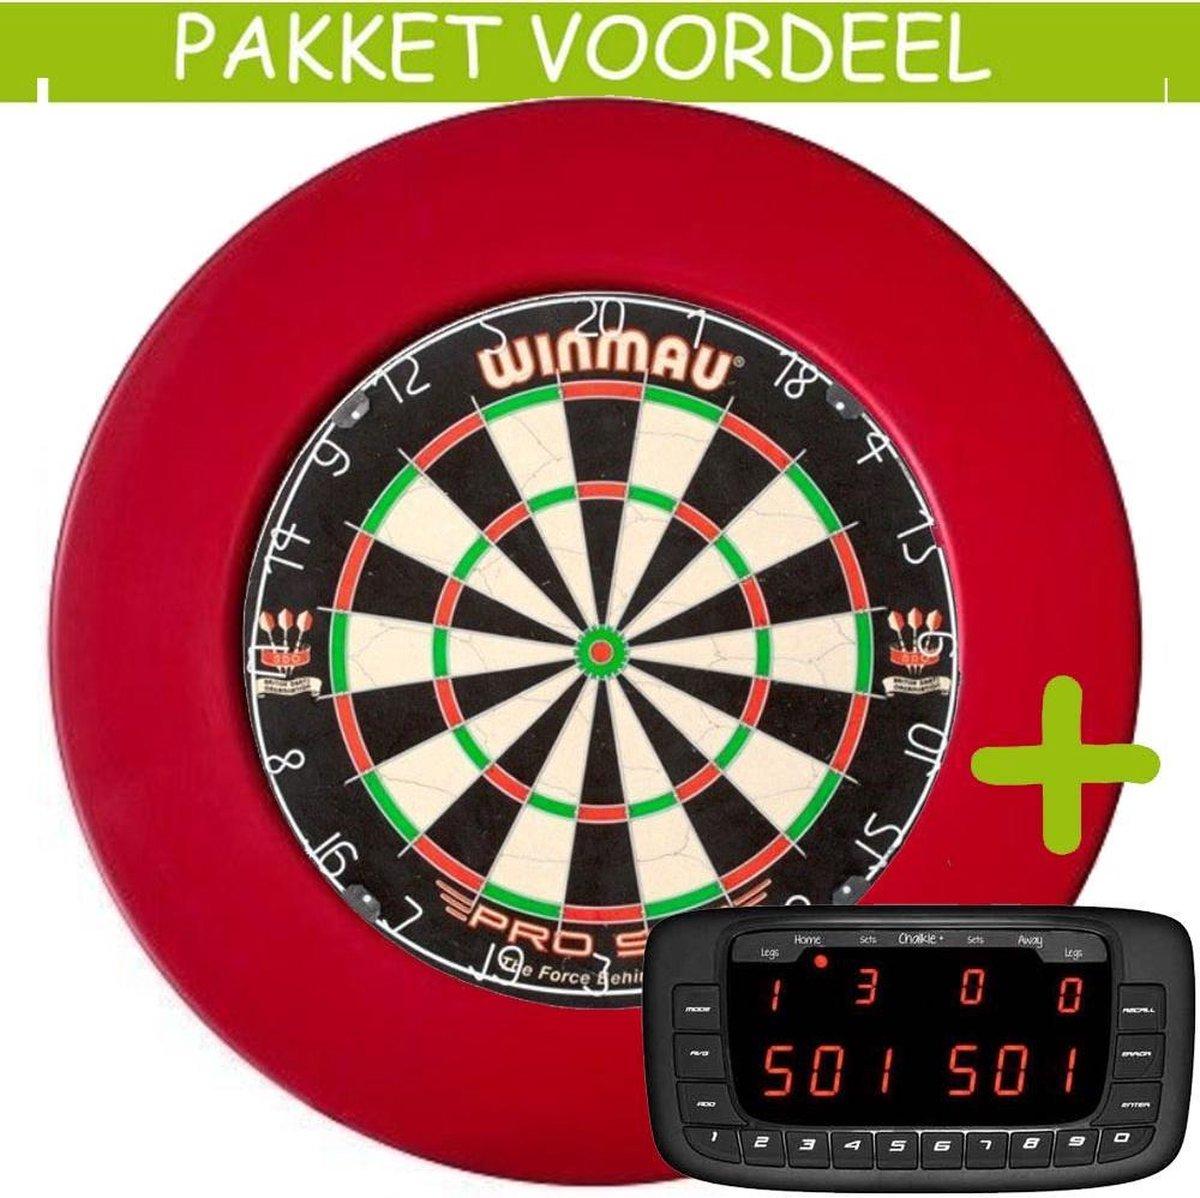 Elektronisch Dart Scorebord VoordeelPakket (Chalkie + ) - Pro SFB - Rubberen Surround (Rood)